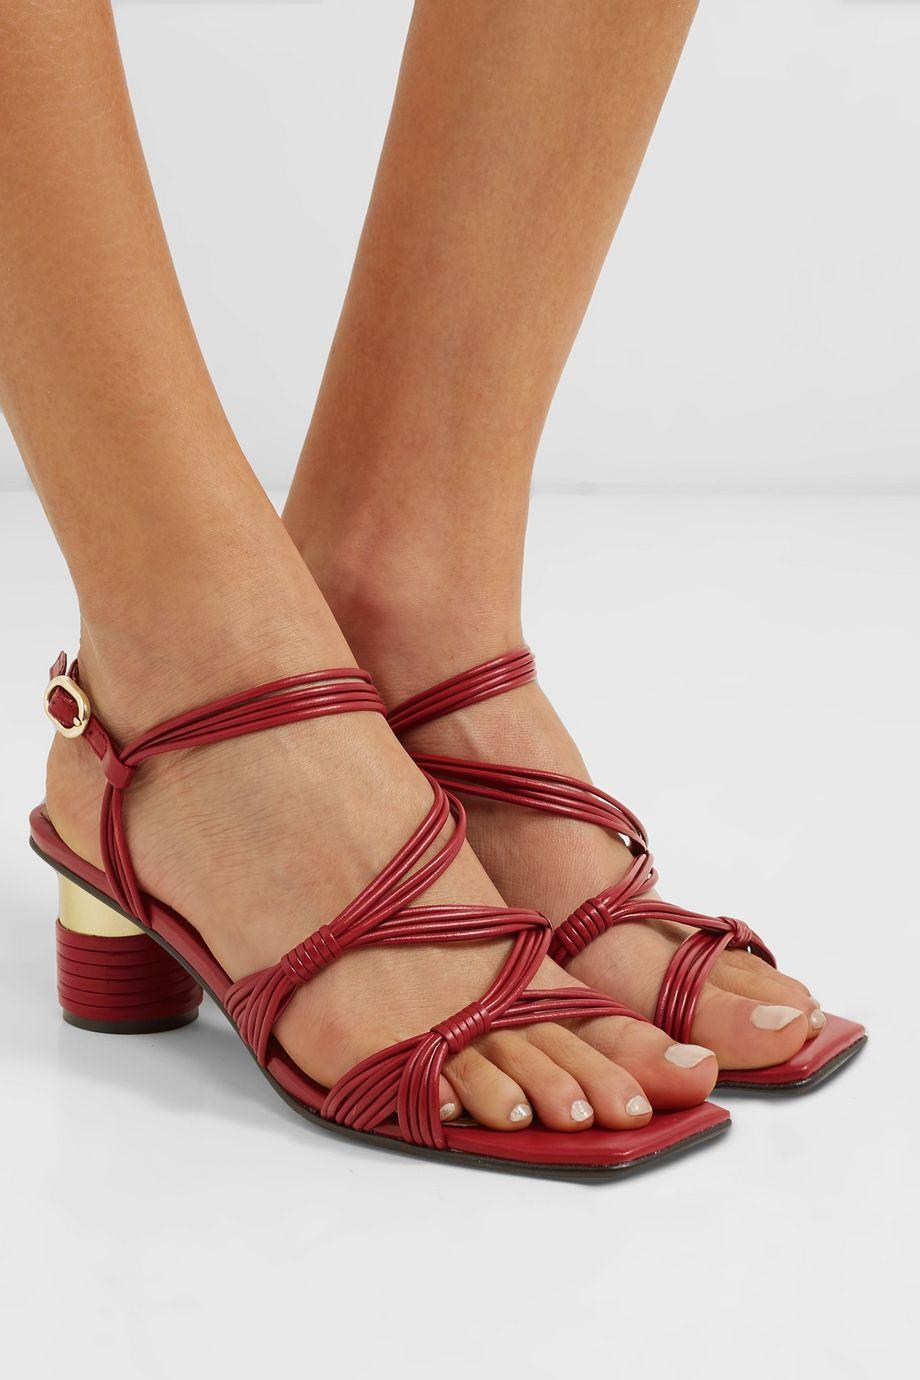 Souliers Martinez Cartagena leather sandals